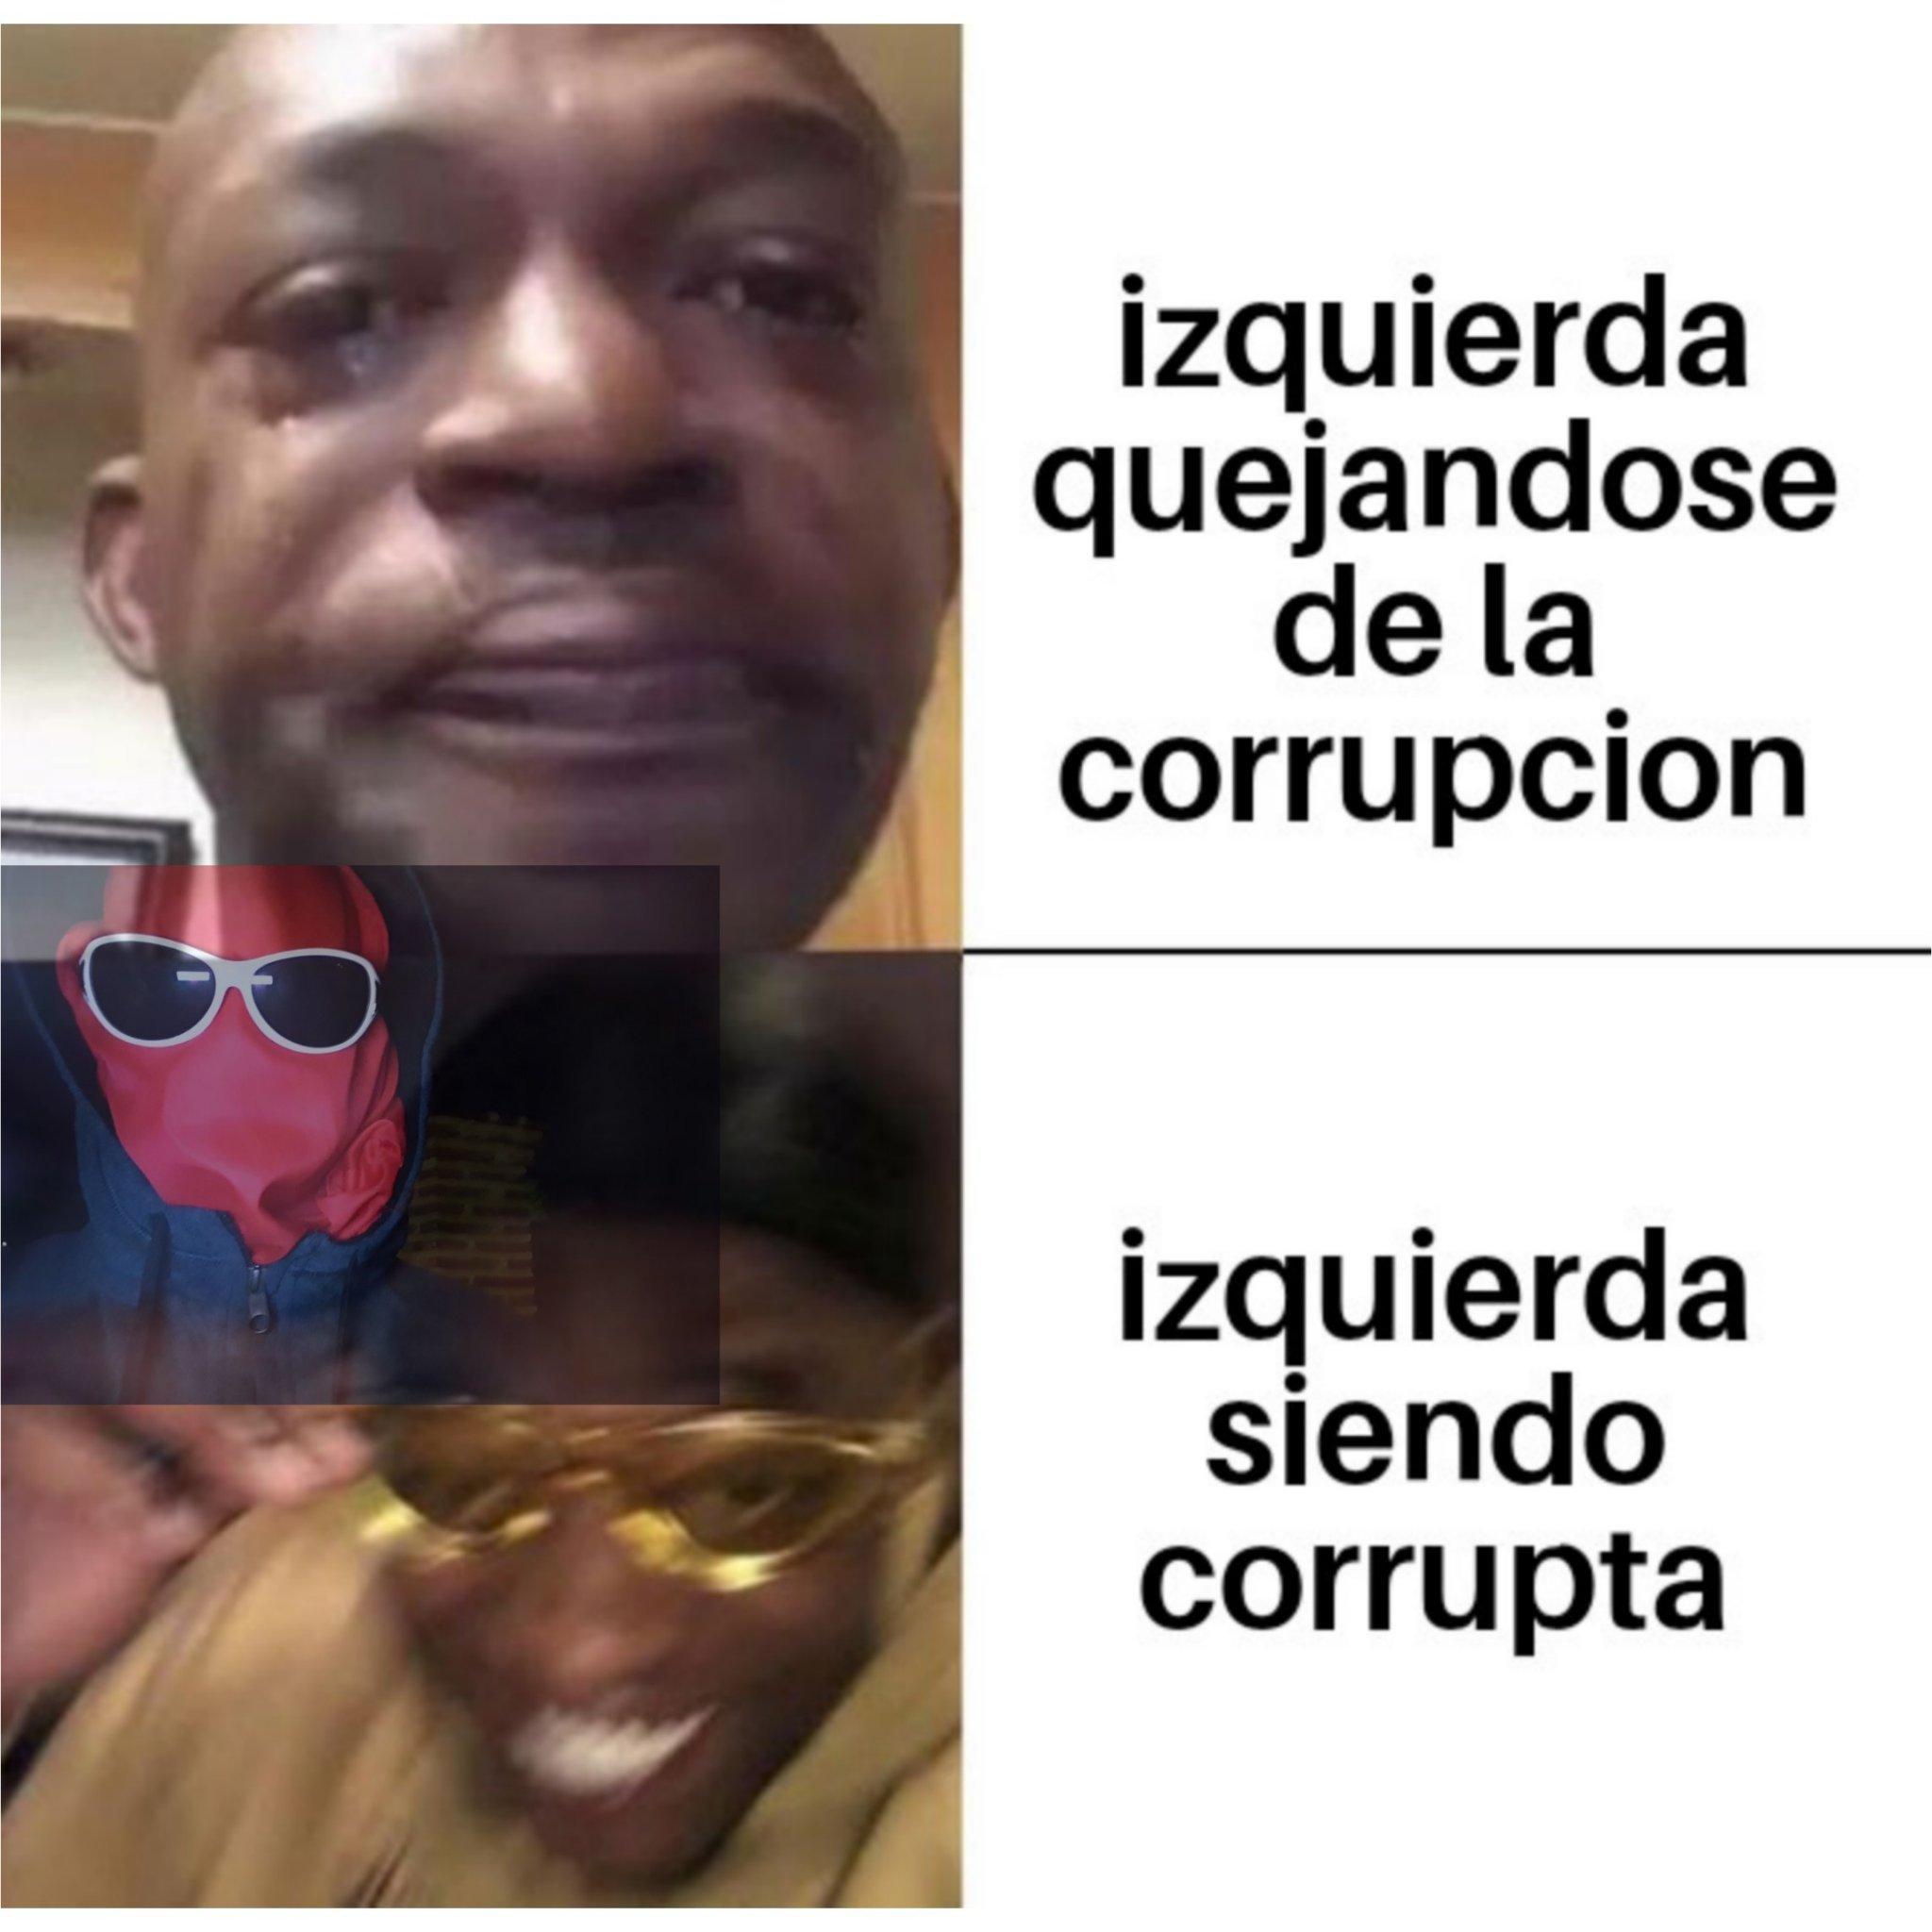 Pedro sanchez in a nutsell - meme